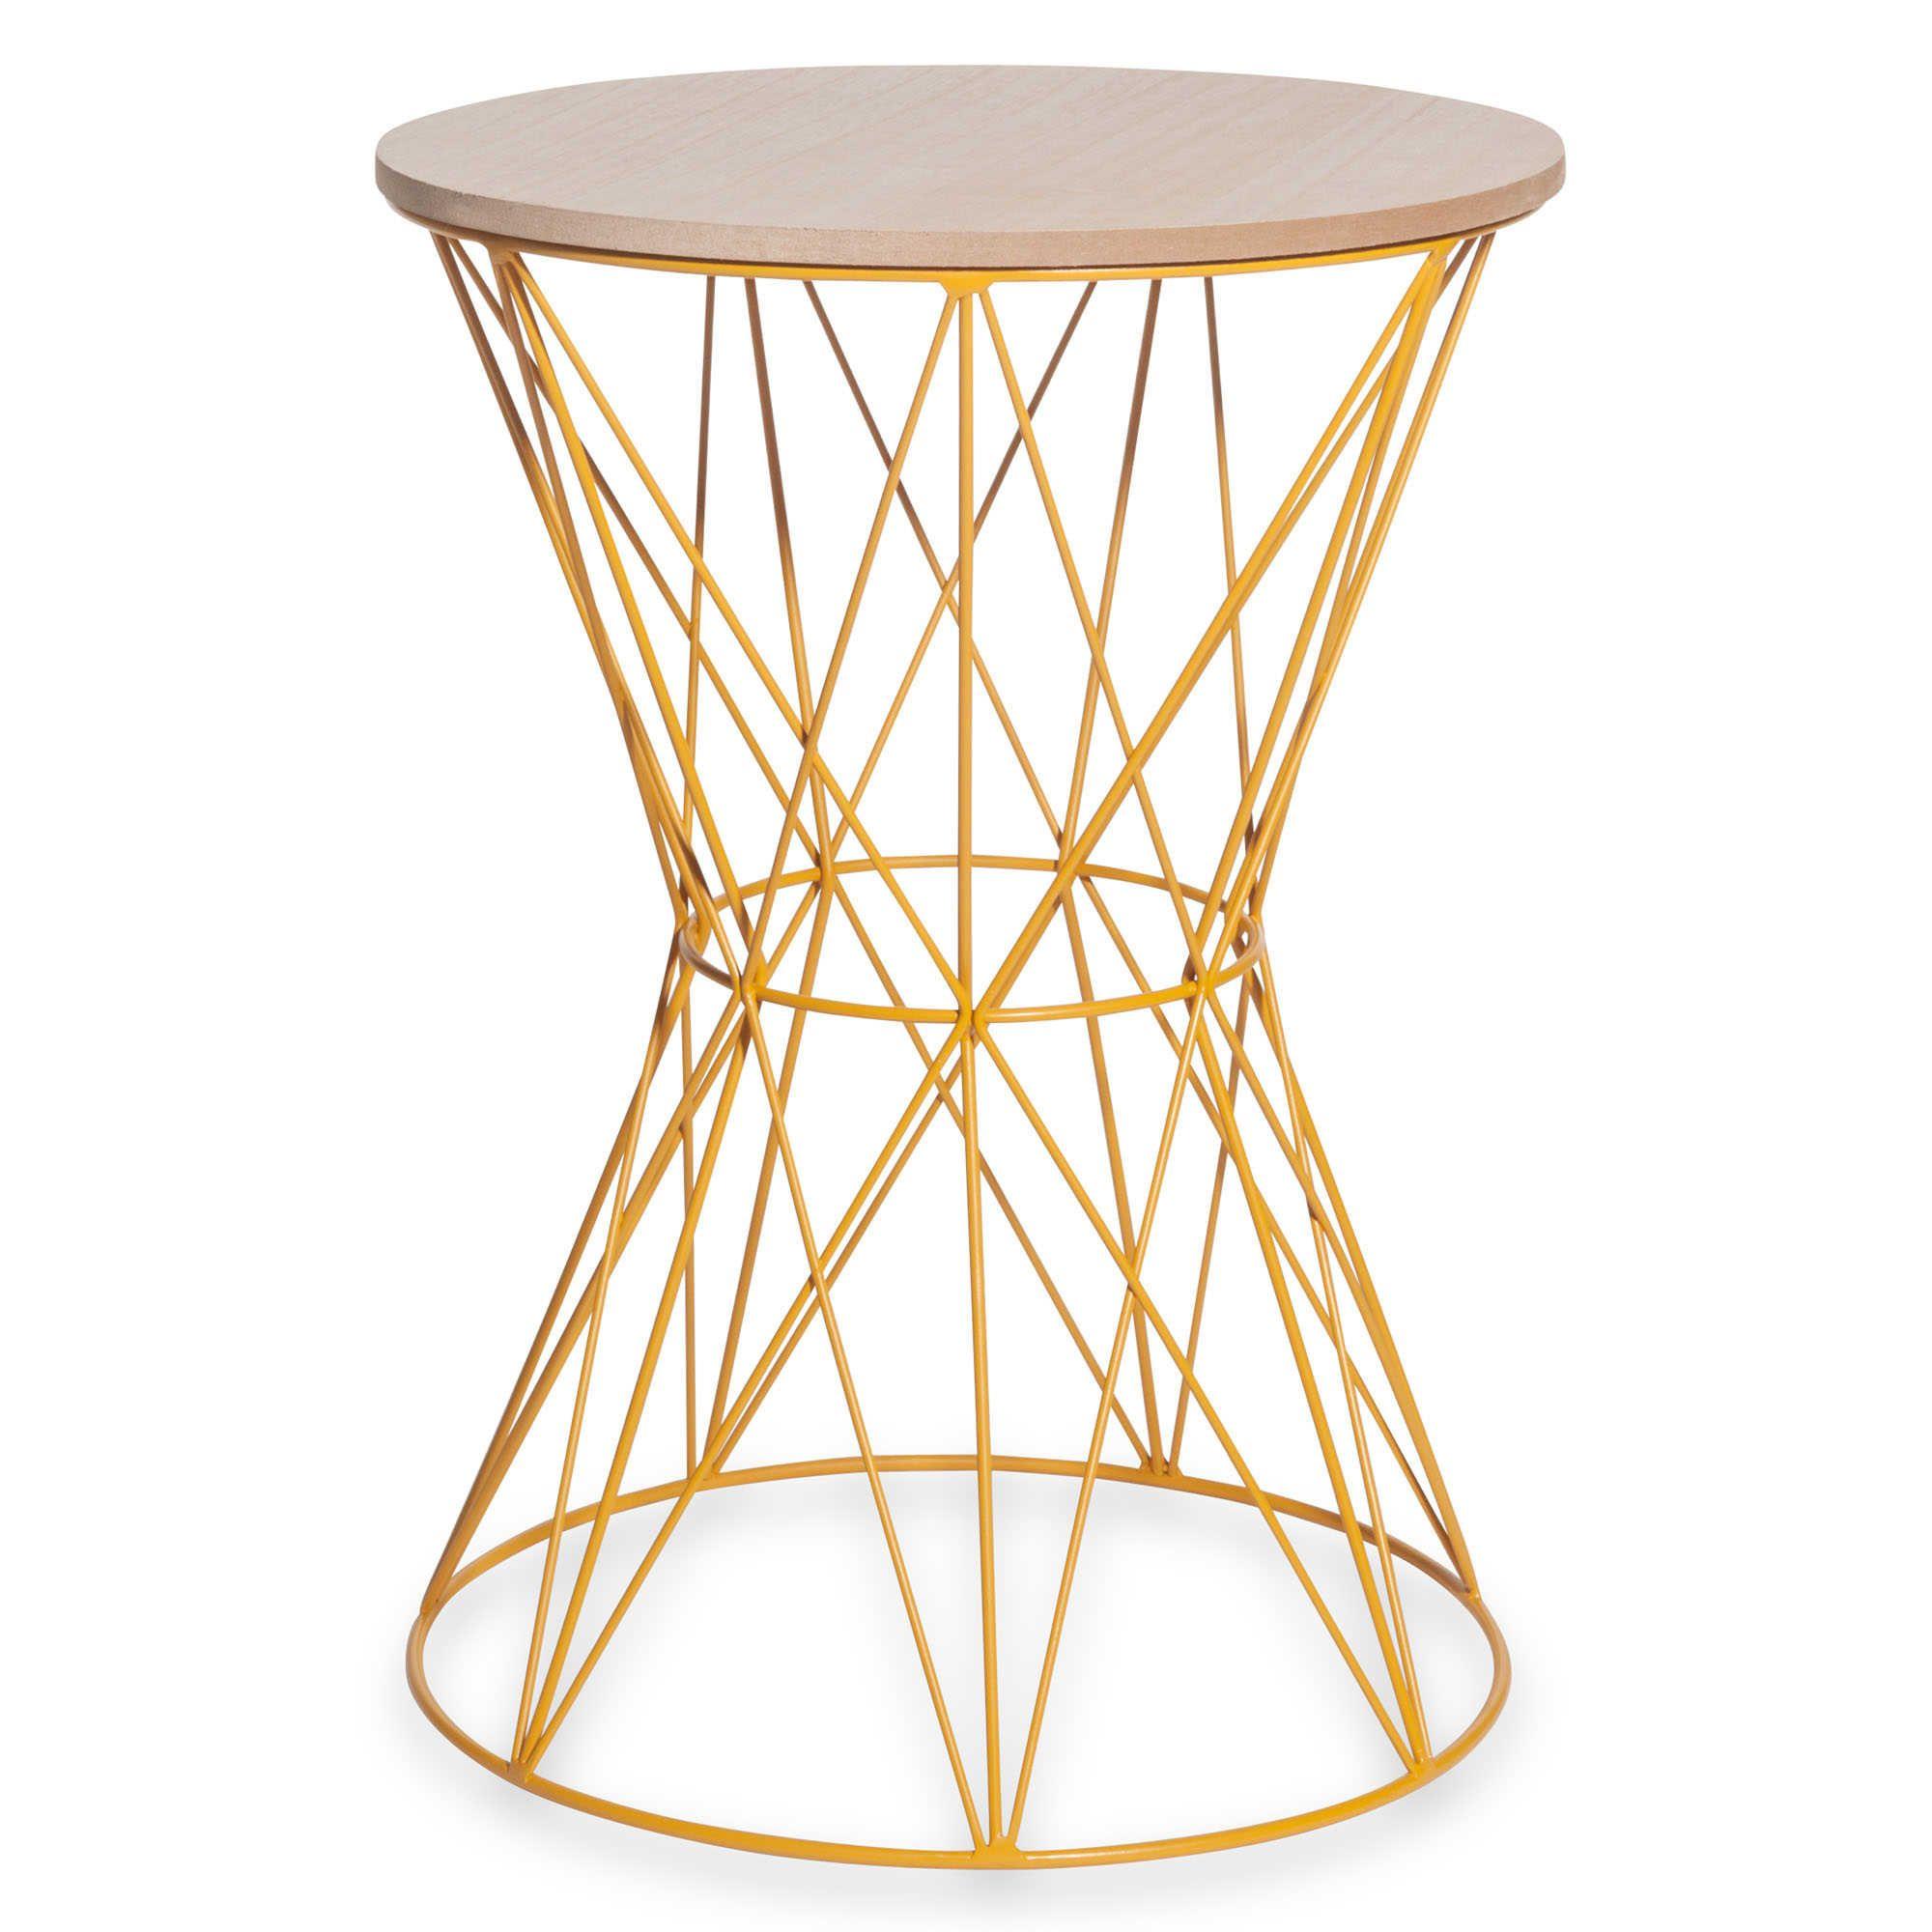 Meubles D Appoint Wood End Tables End Tables Orange Sofa